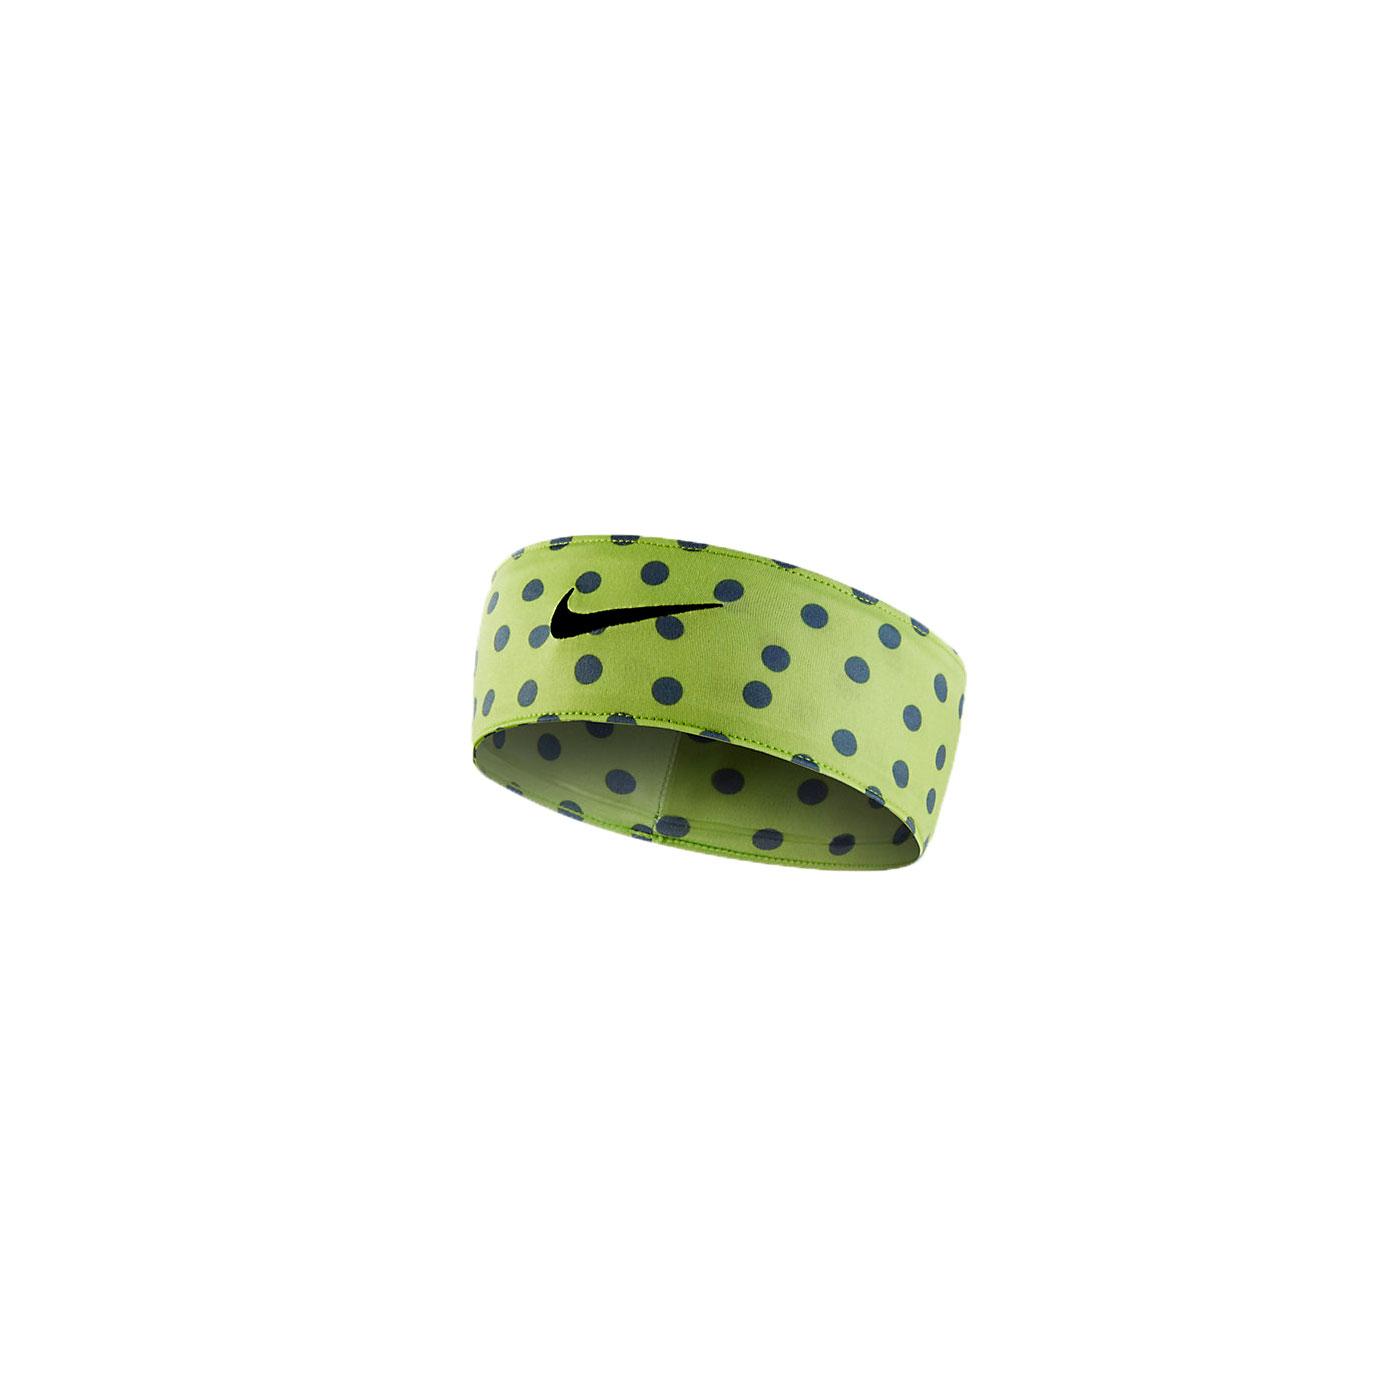 NIKE 頭帶 NJN69010OS - 綠黑